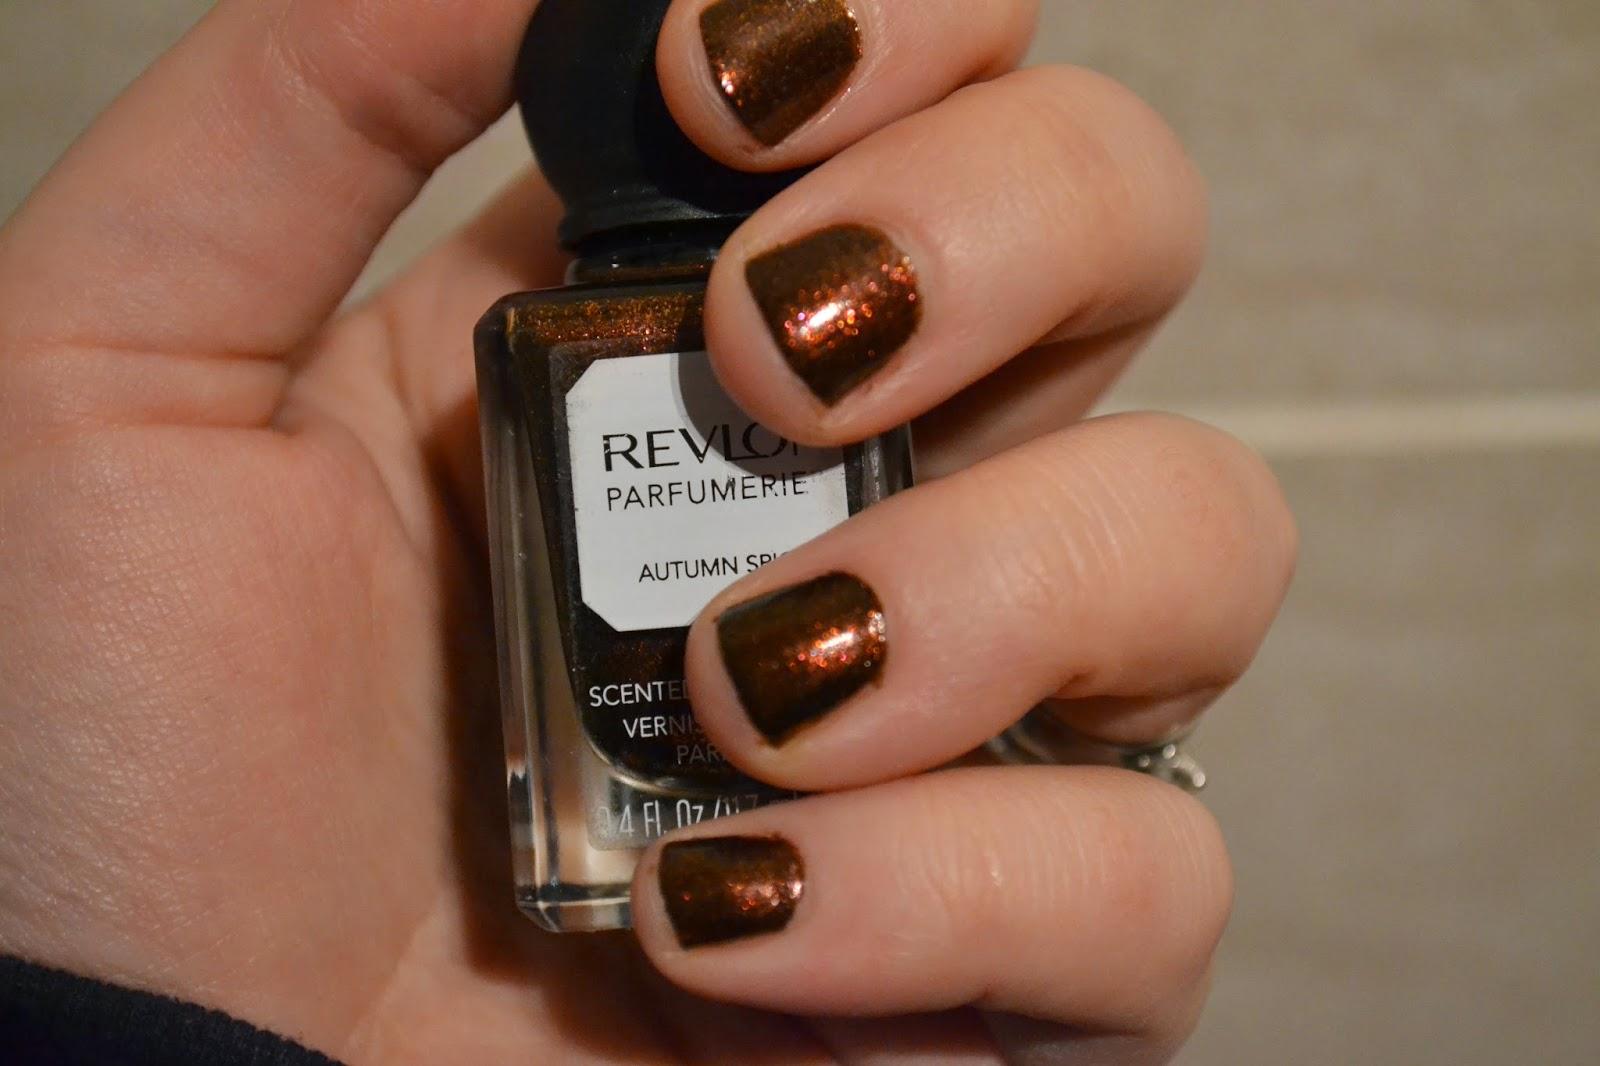 revlon-parfumerie-nail-polish-autumn-spice